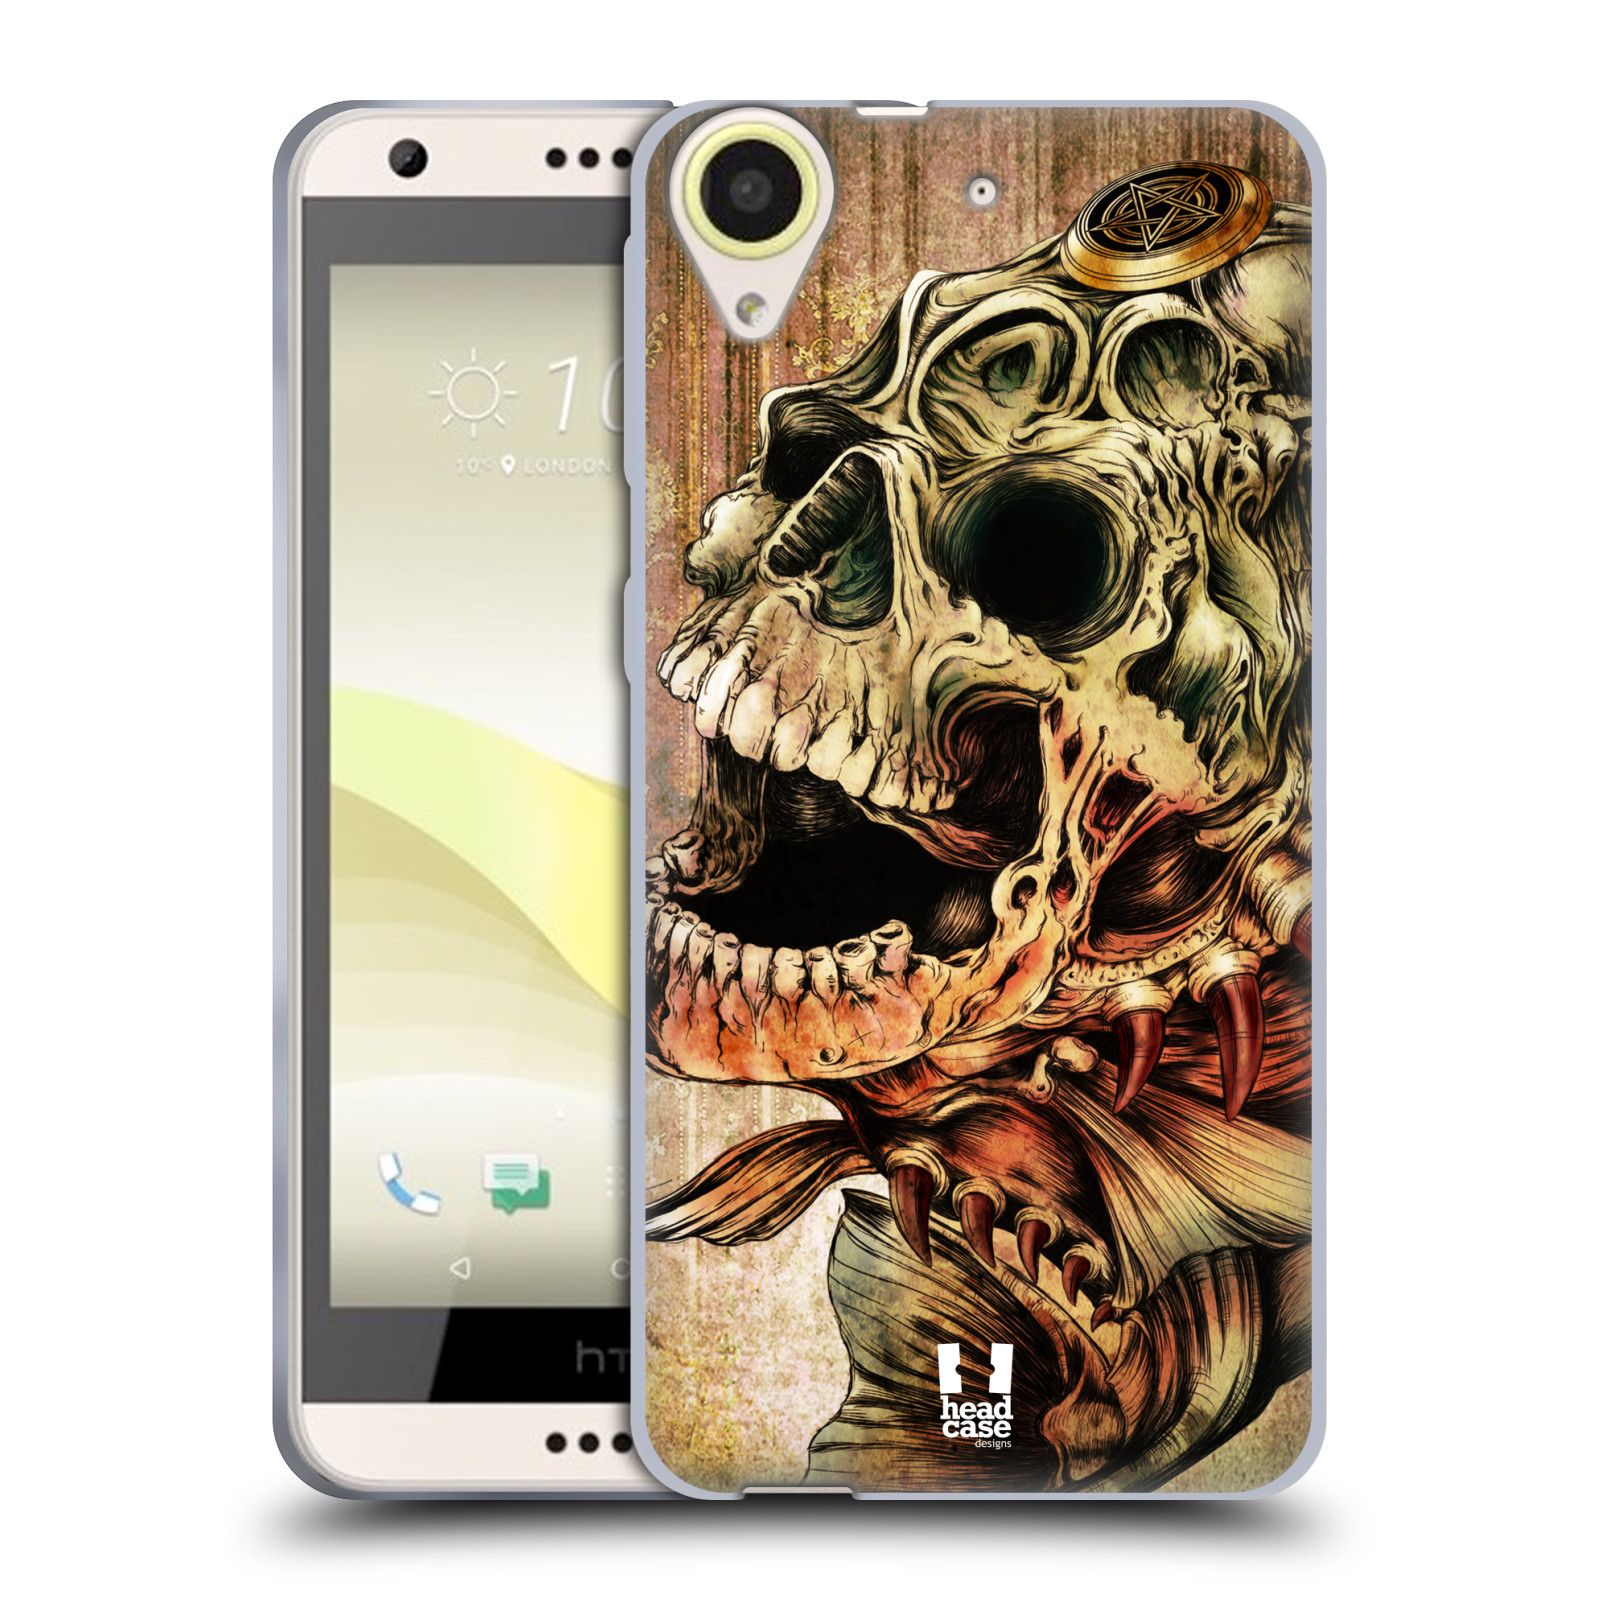 Silikonové pouzdro na mobil HTC Desire 650 HEAD CASE PIRANHA (Silikonový kryt či obal na mobilní telefon HTC Desire 650)